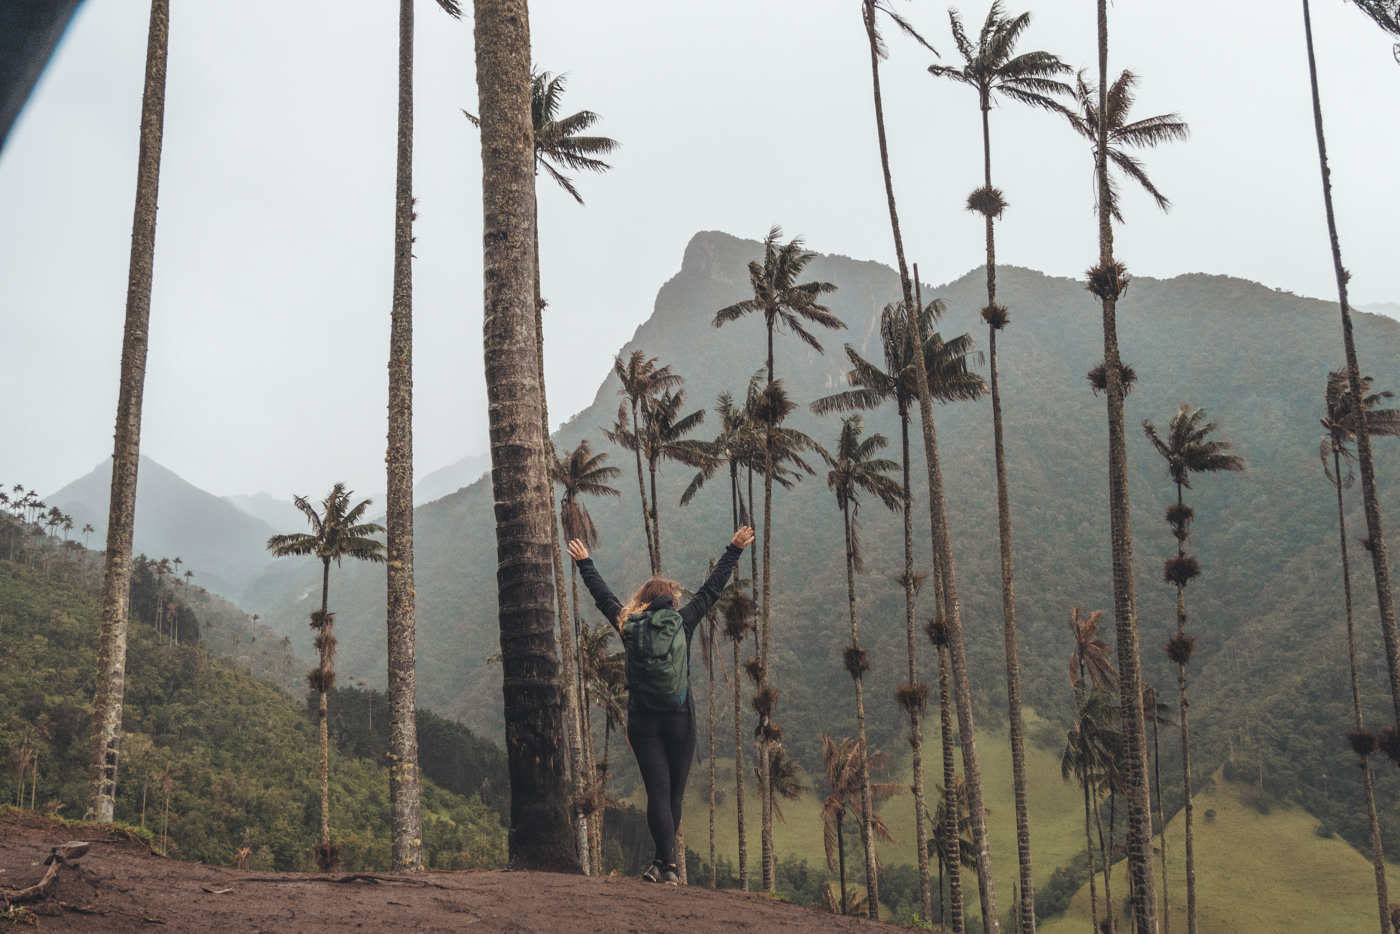 Valle de Cocora – zwischen Wachspalmen & Regenwolken.